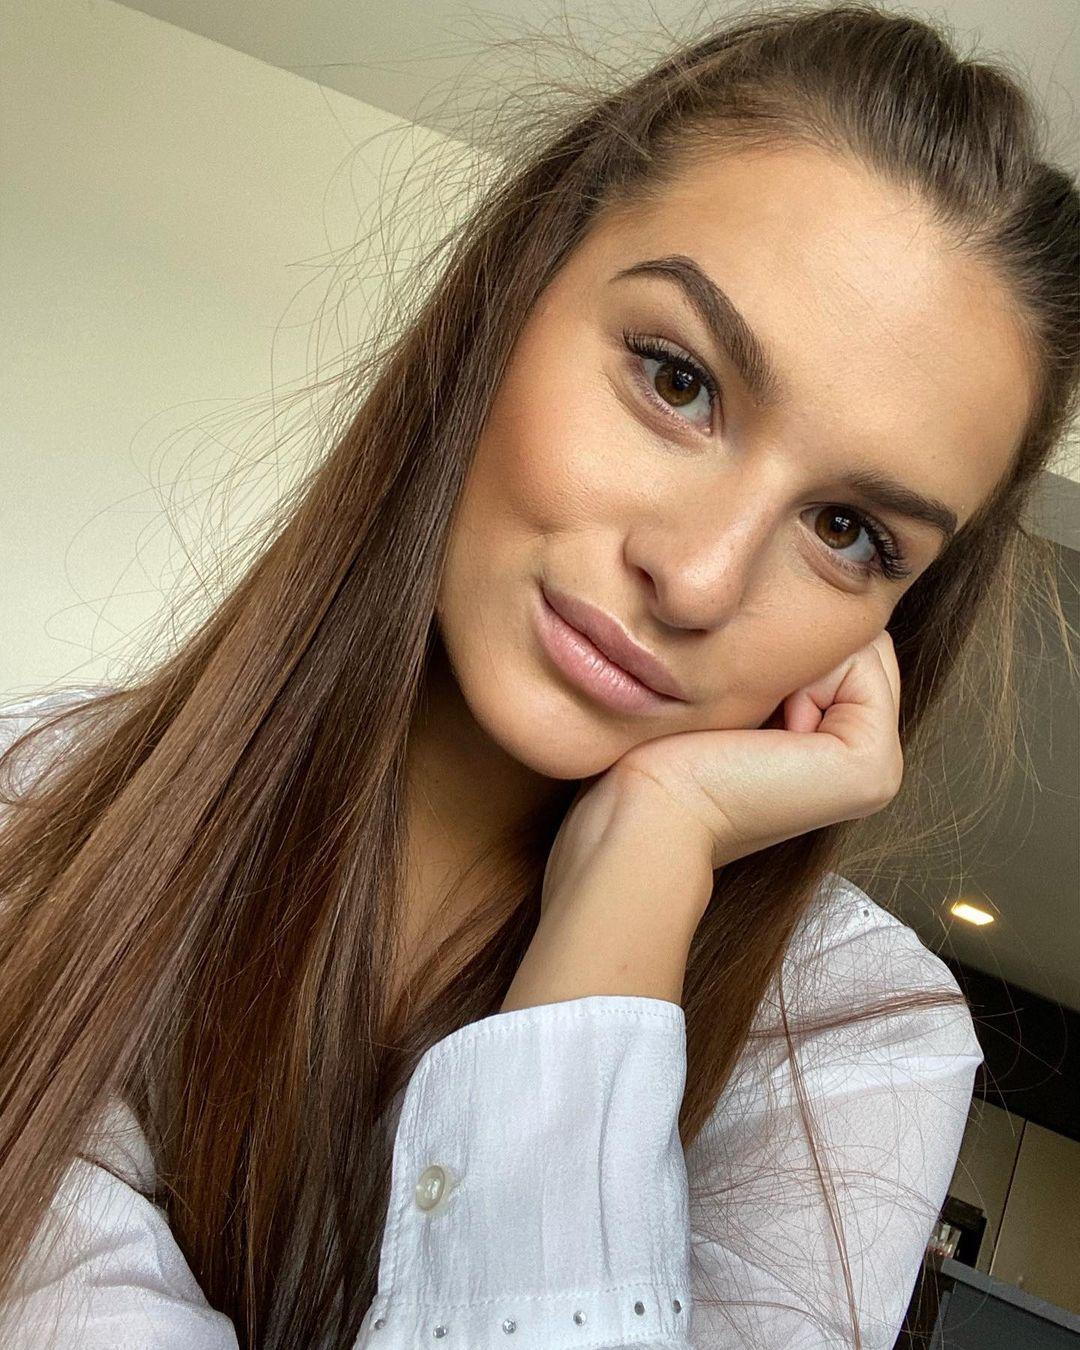 Dominika-Vinsova-Wallpapers-Insta-Fit-Bio-7